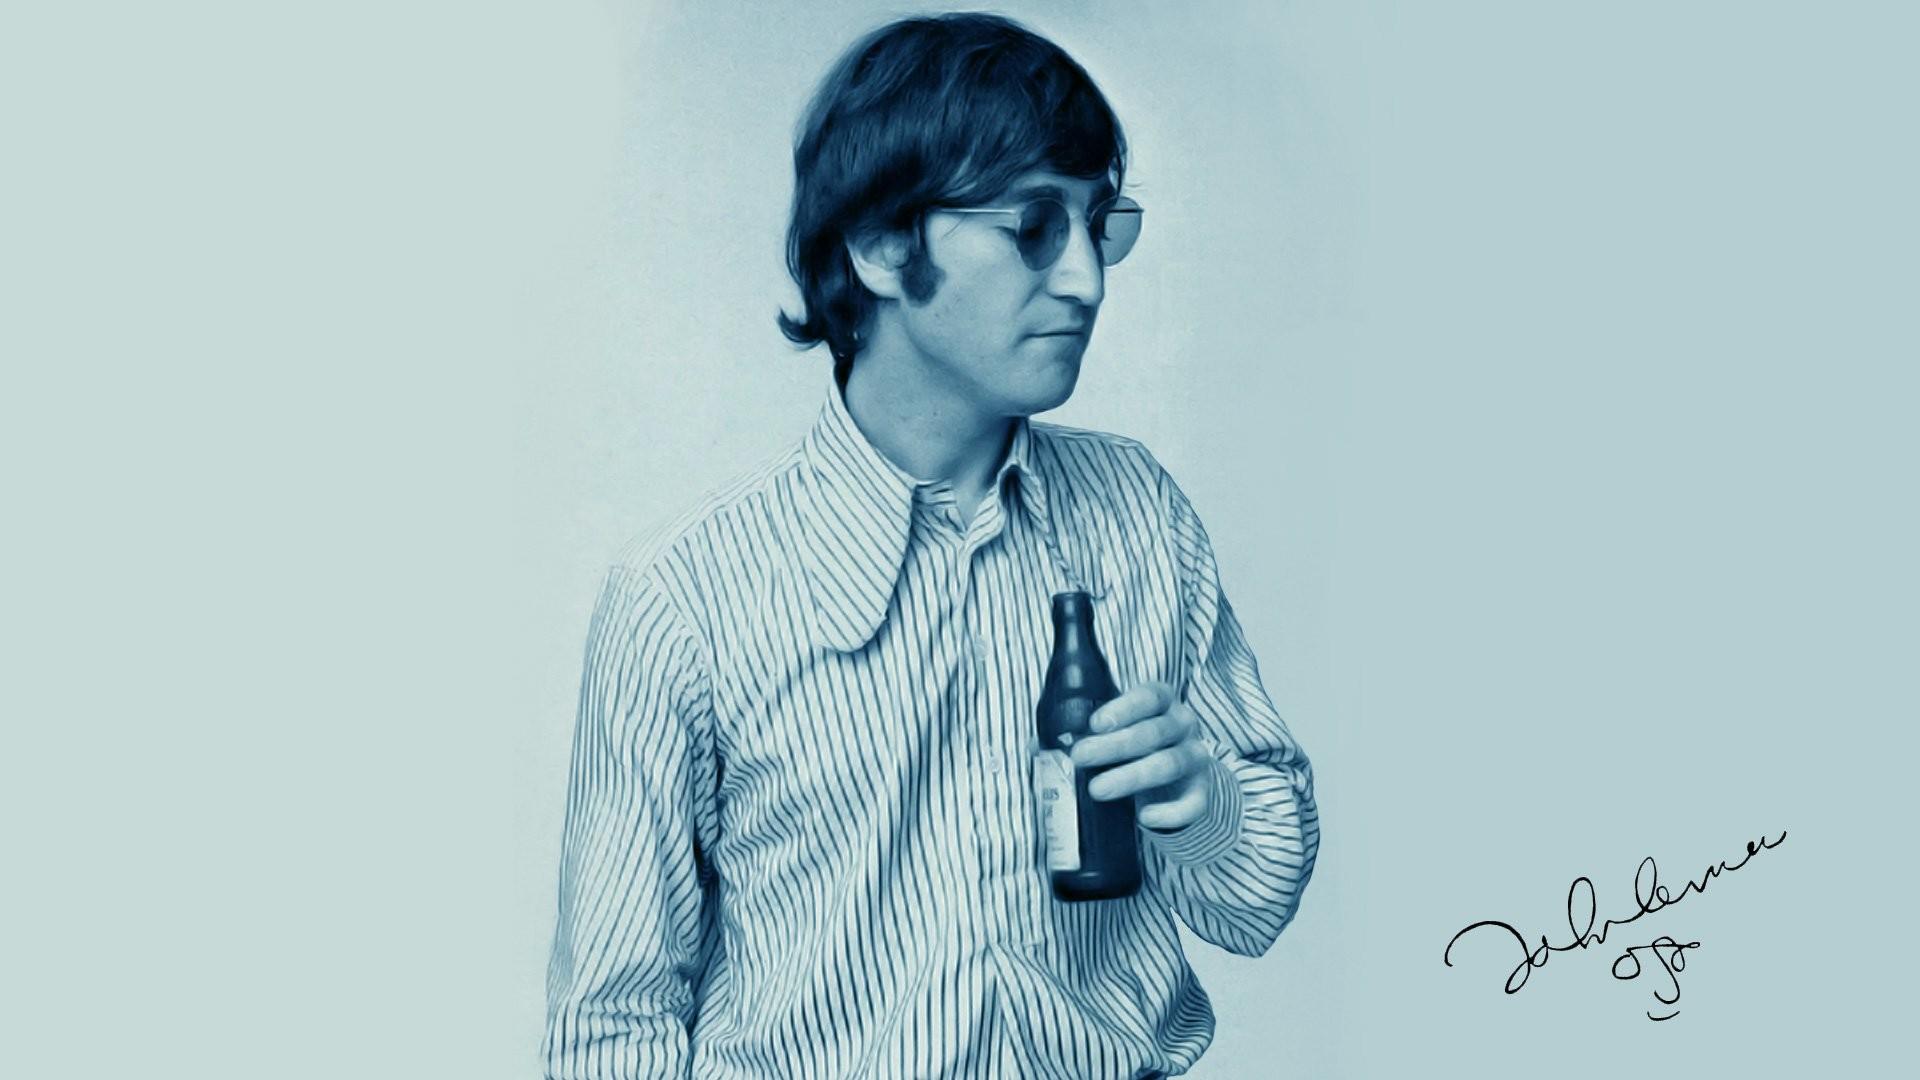 John lennon imagine Wallpapers HD Wallpapers 1000×1442 Lennon Wallpapers  (45 Wallpapers)  